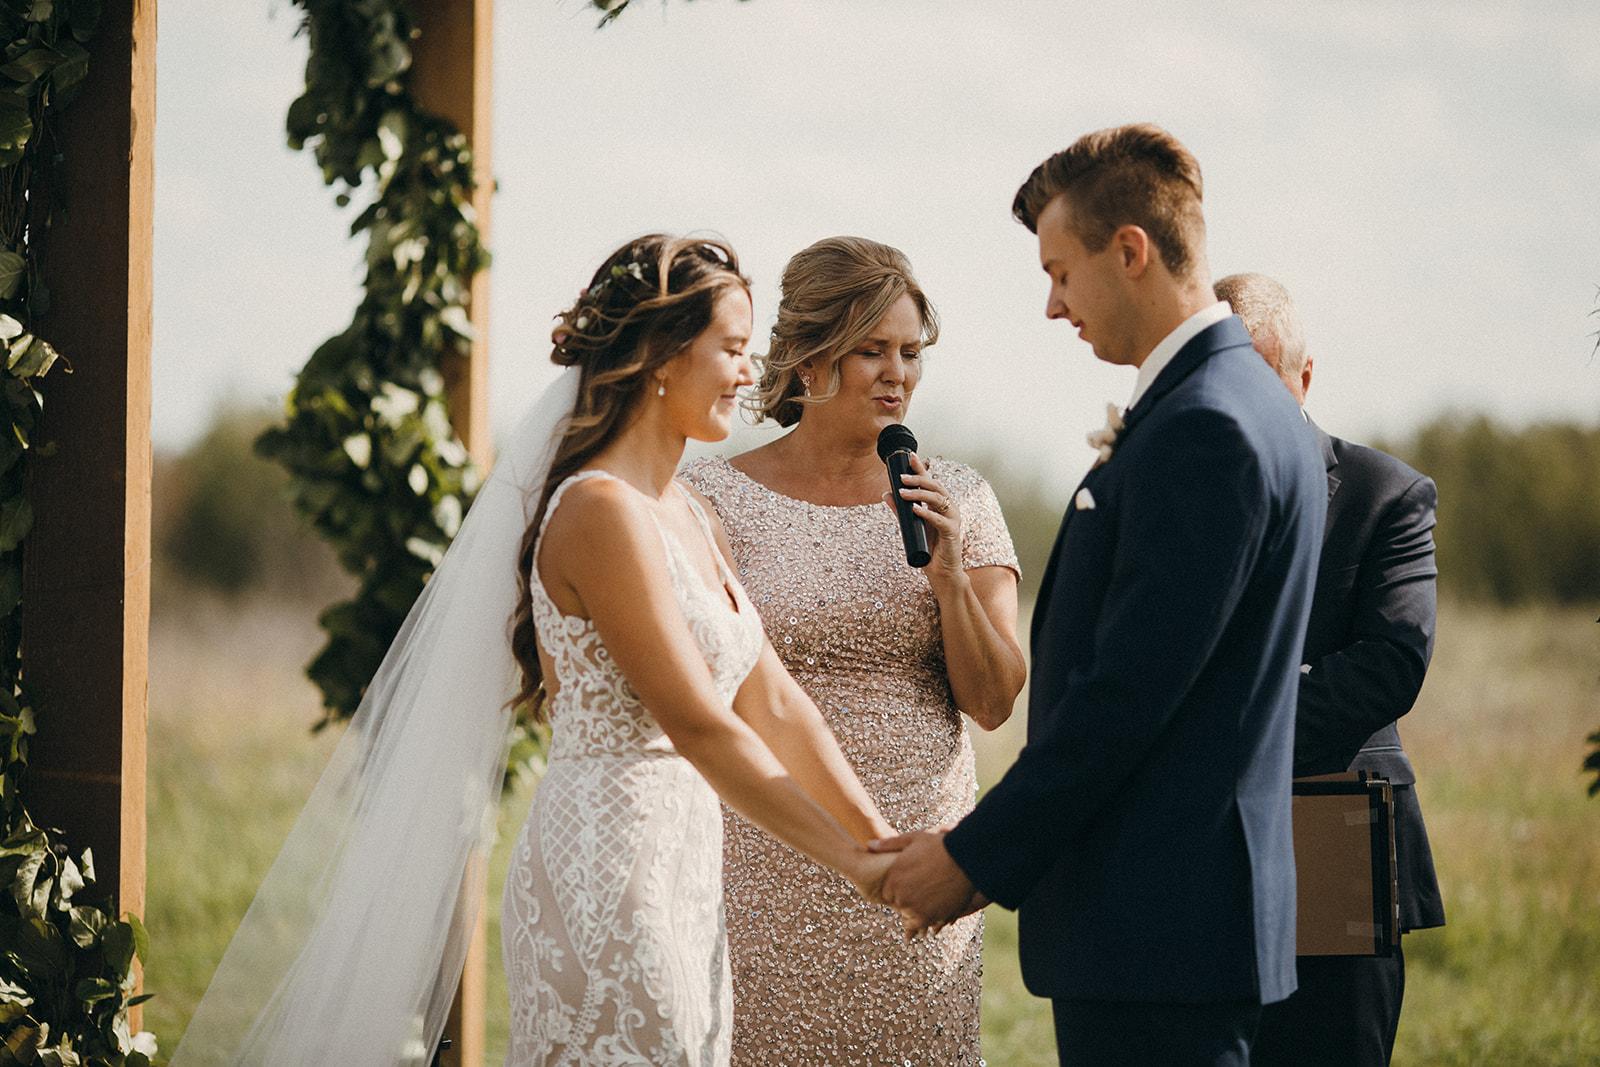 kaden_justine_wedding_3771.jpg